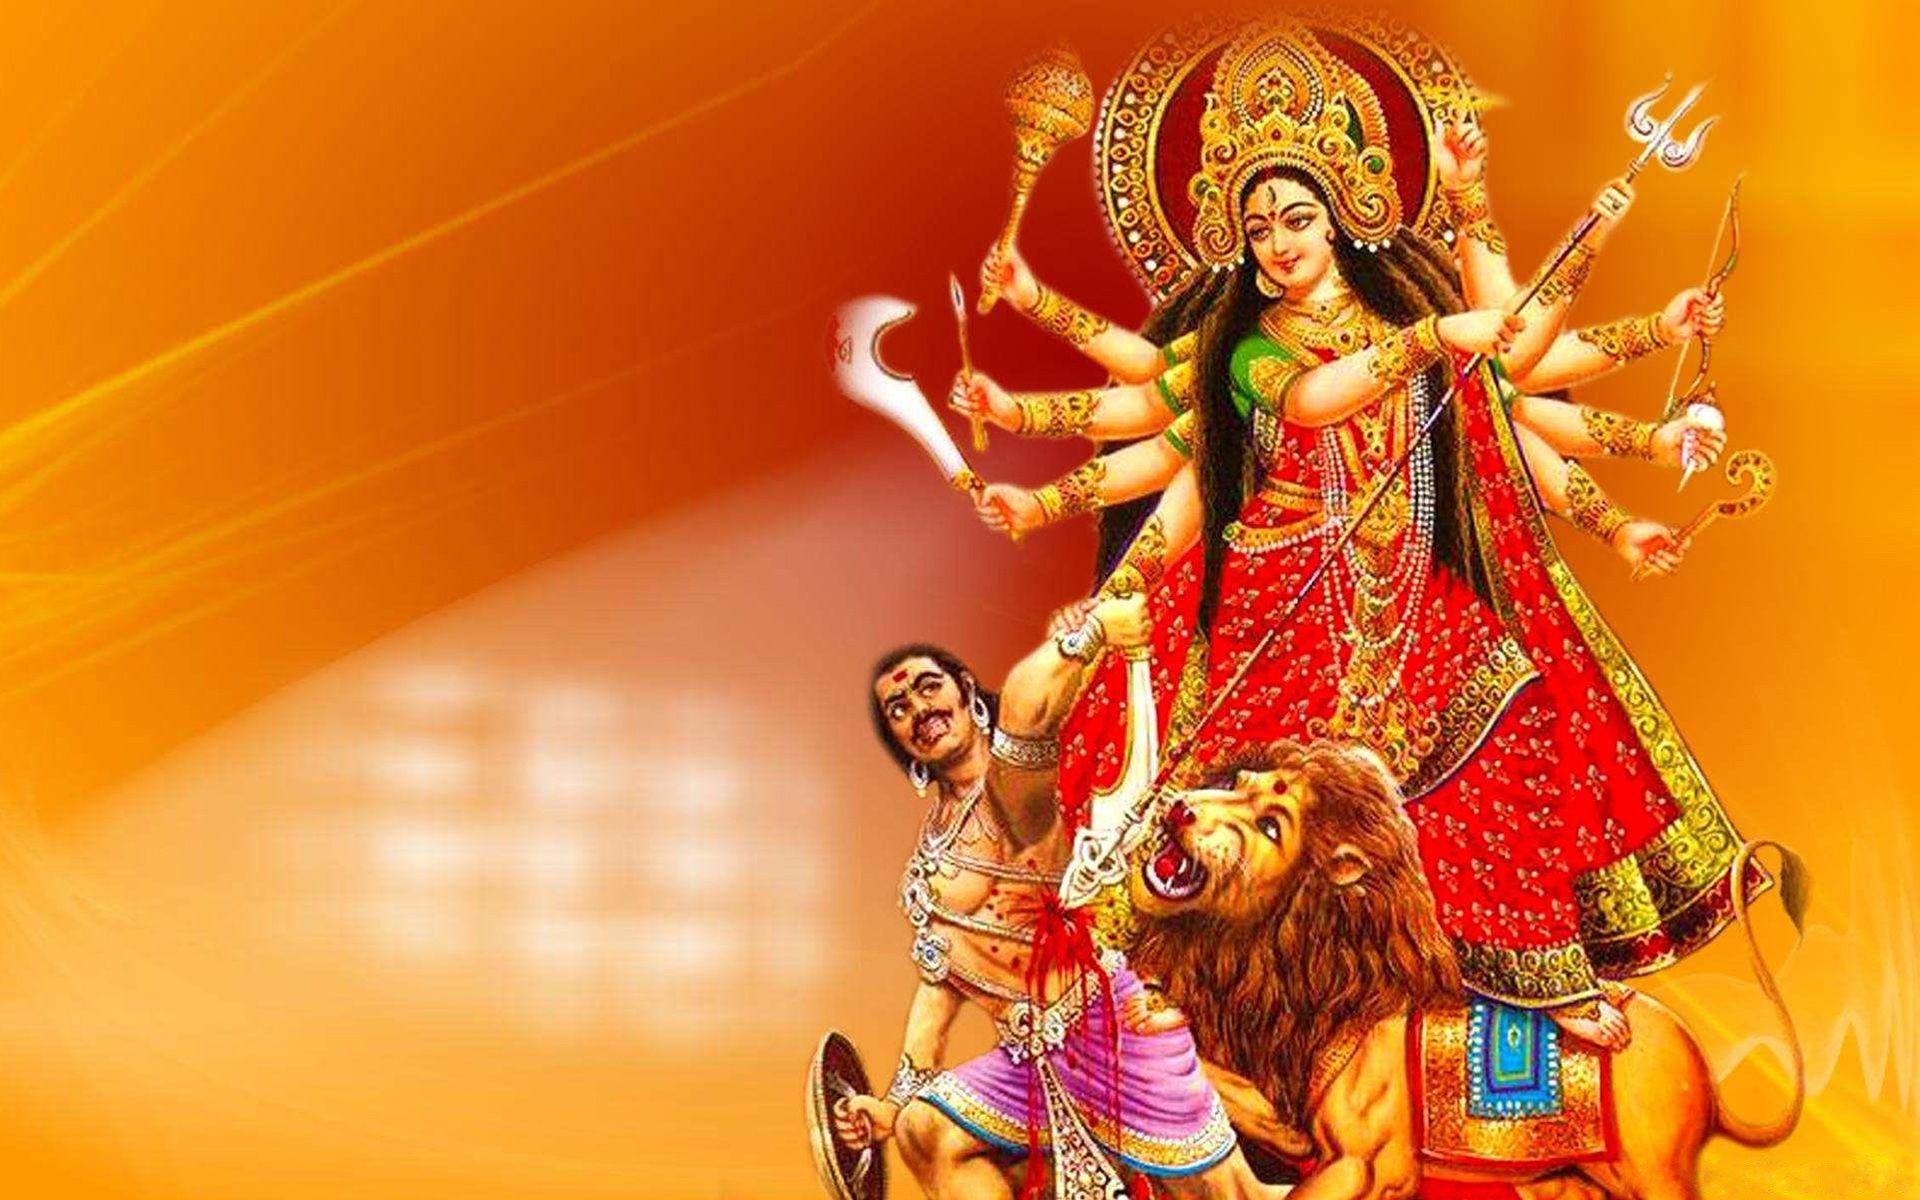 Goddess Durga Happy Navratri Images Navratri Images Durga